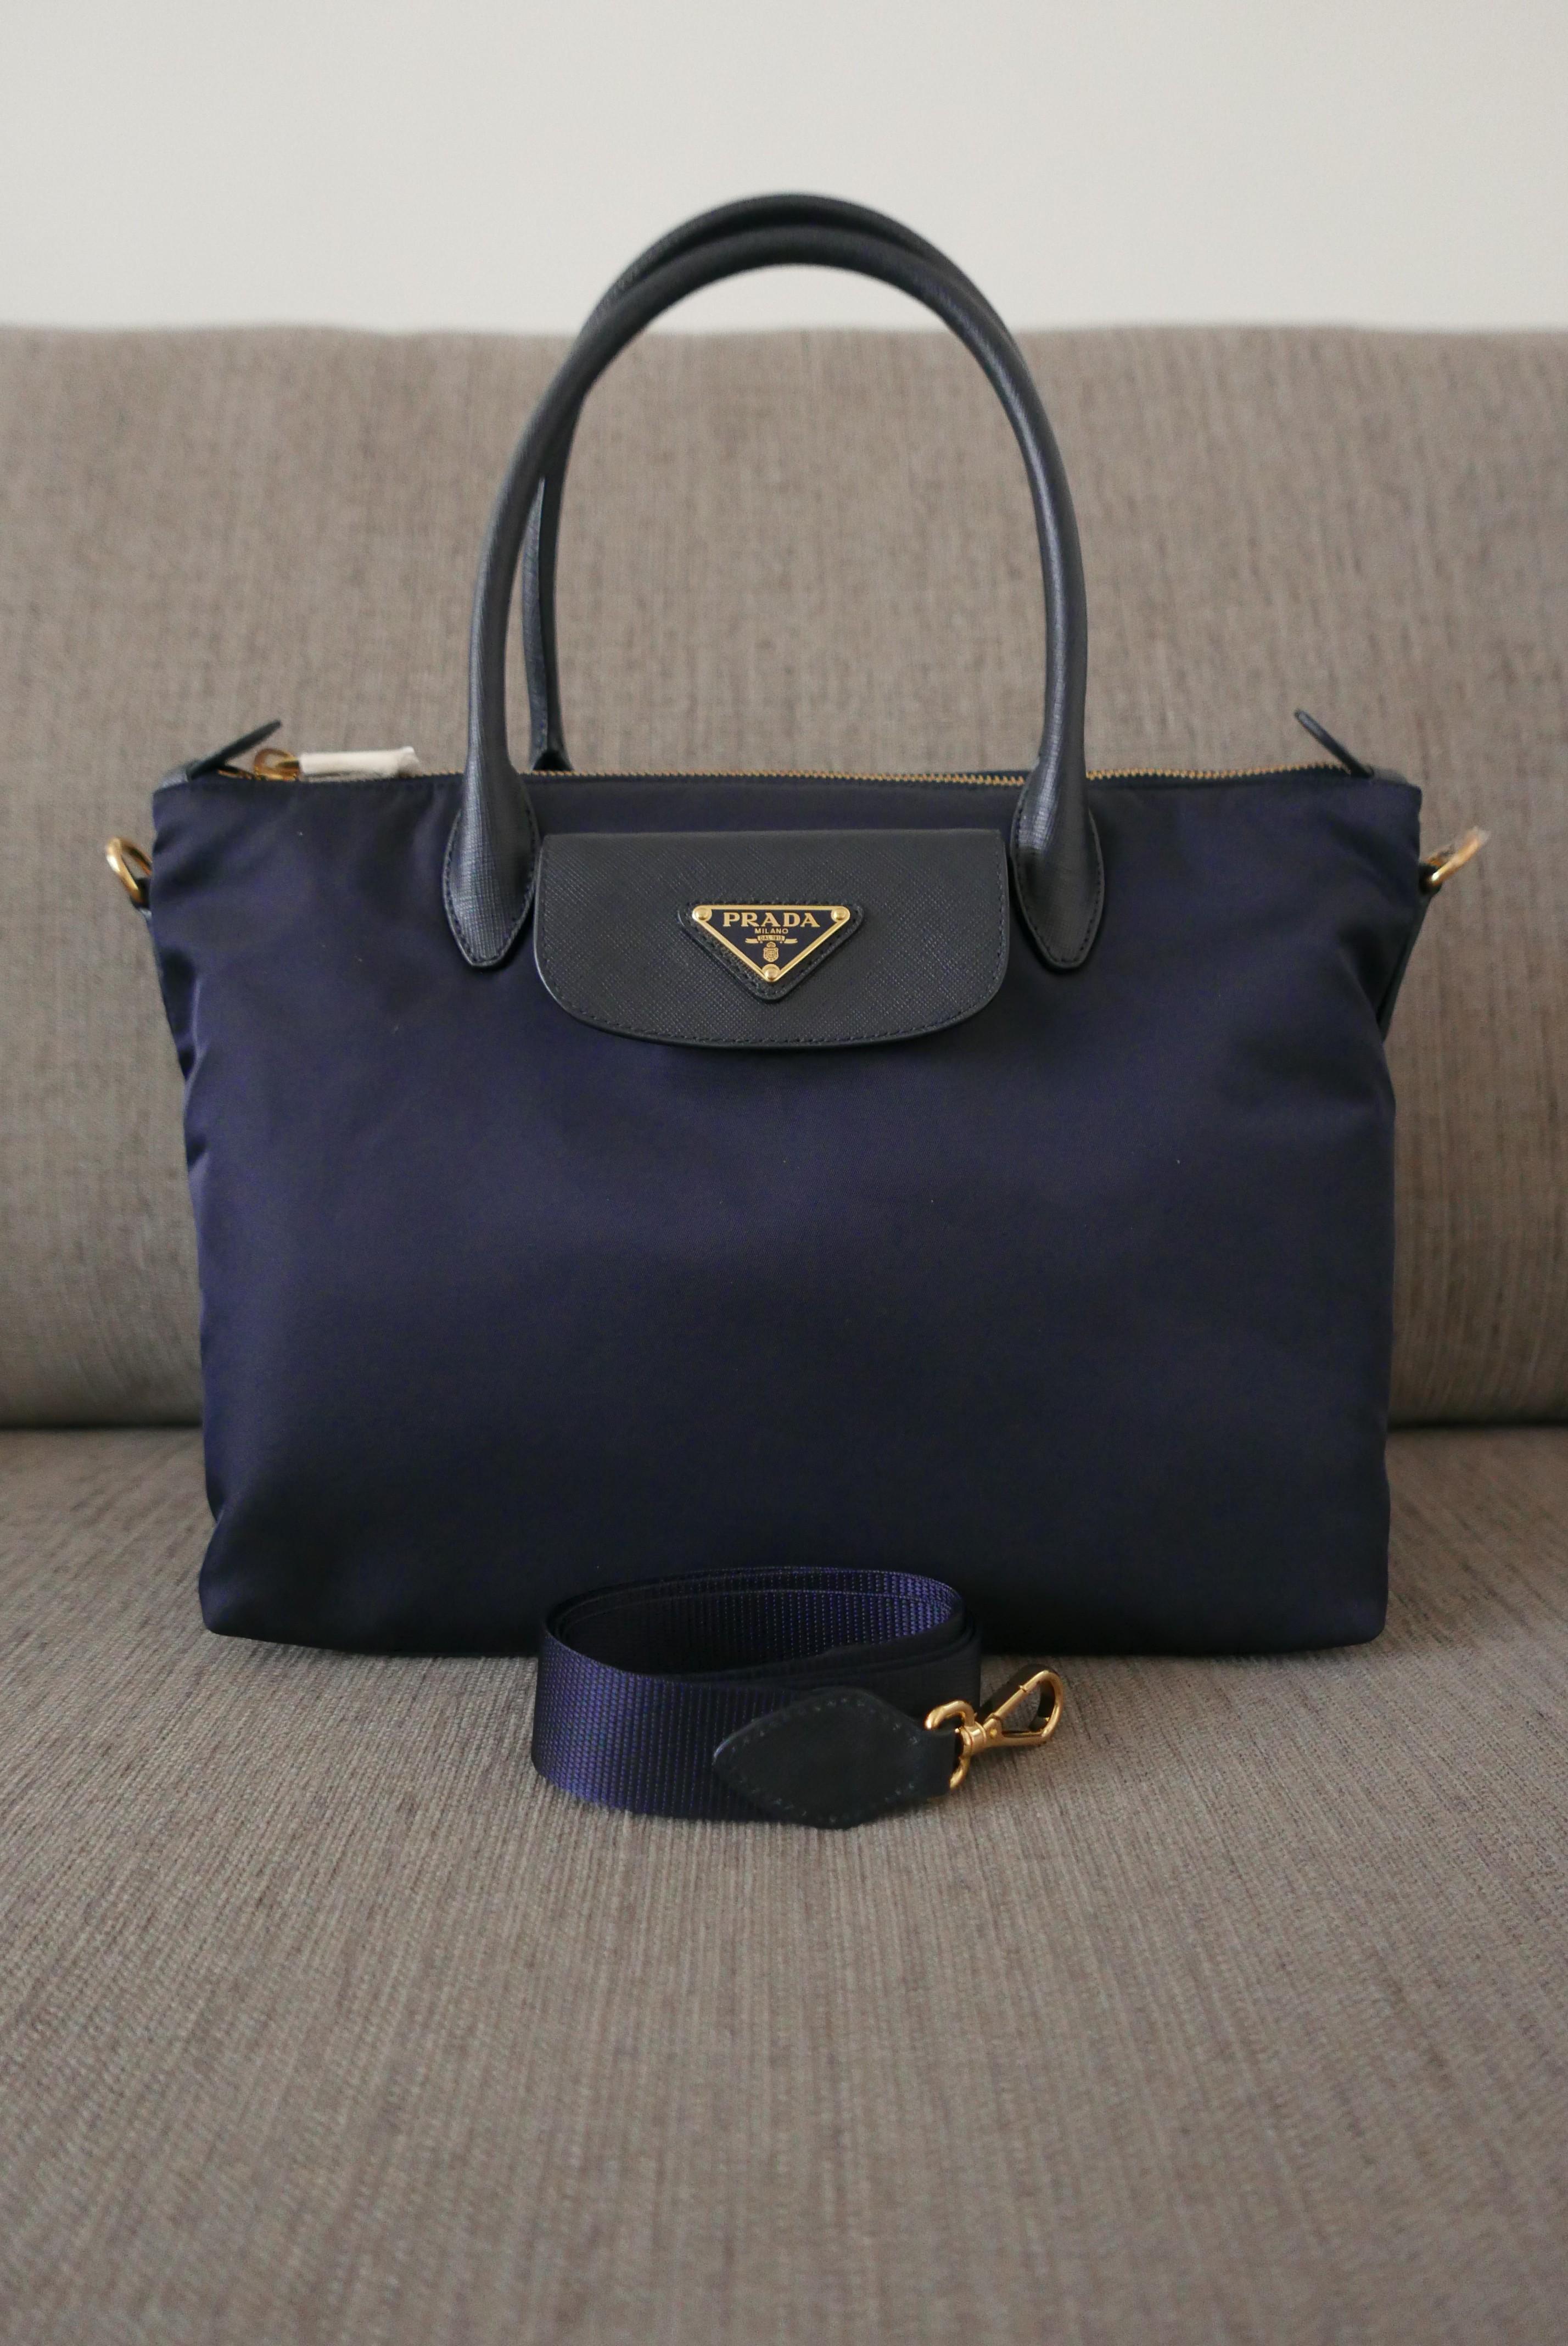 400db3809 Sale! New Auth Prada Tessuto Saffiano Nylon 2Way Bag 1BA106 Bleu ...